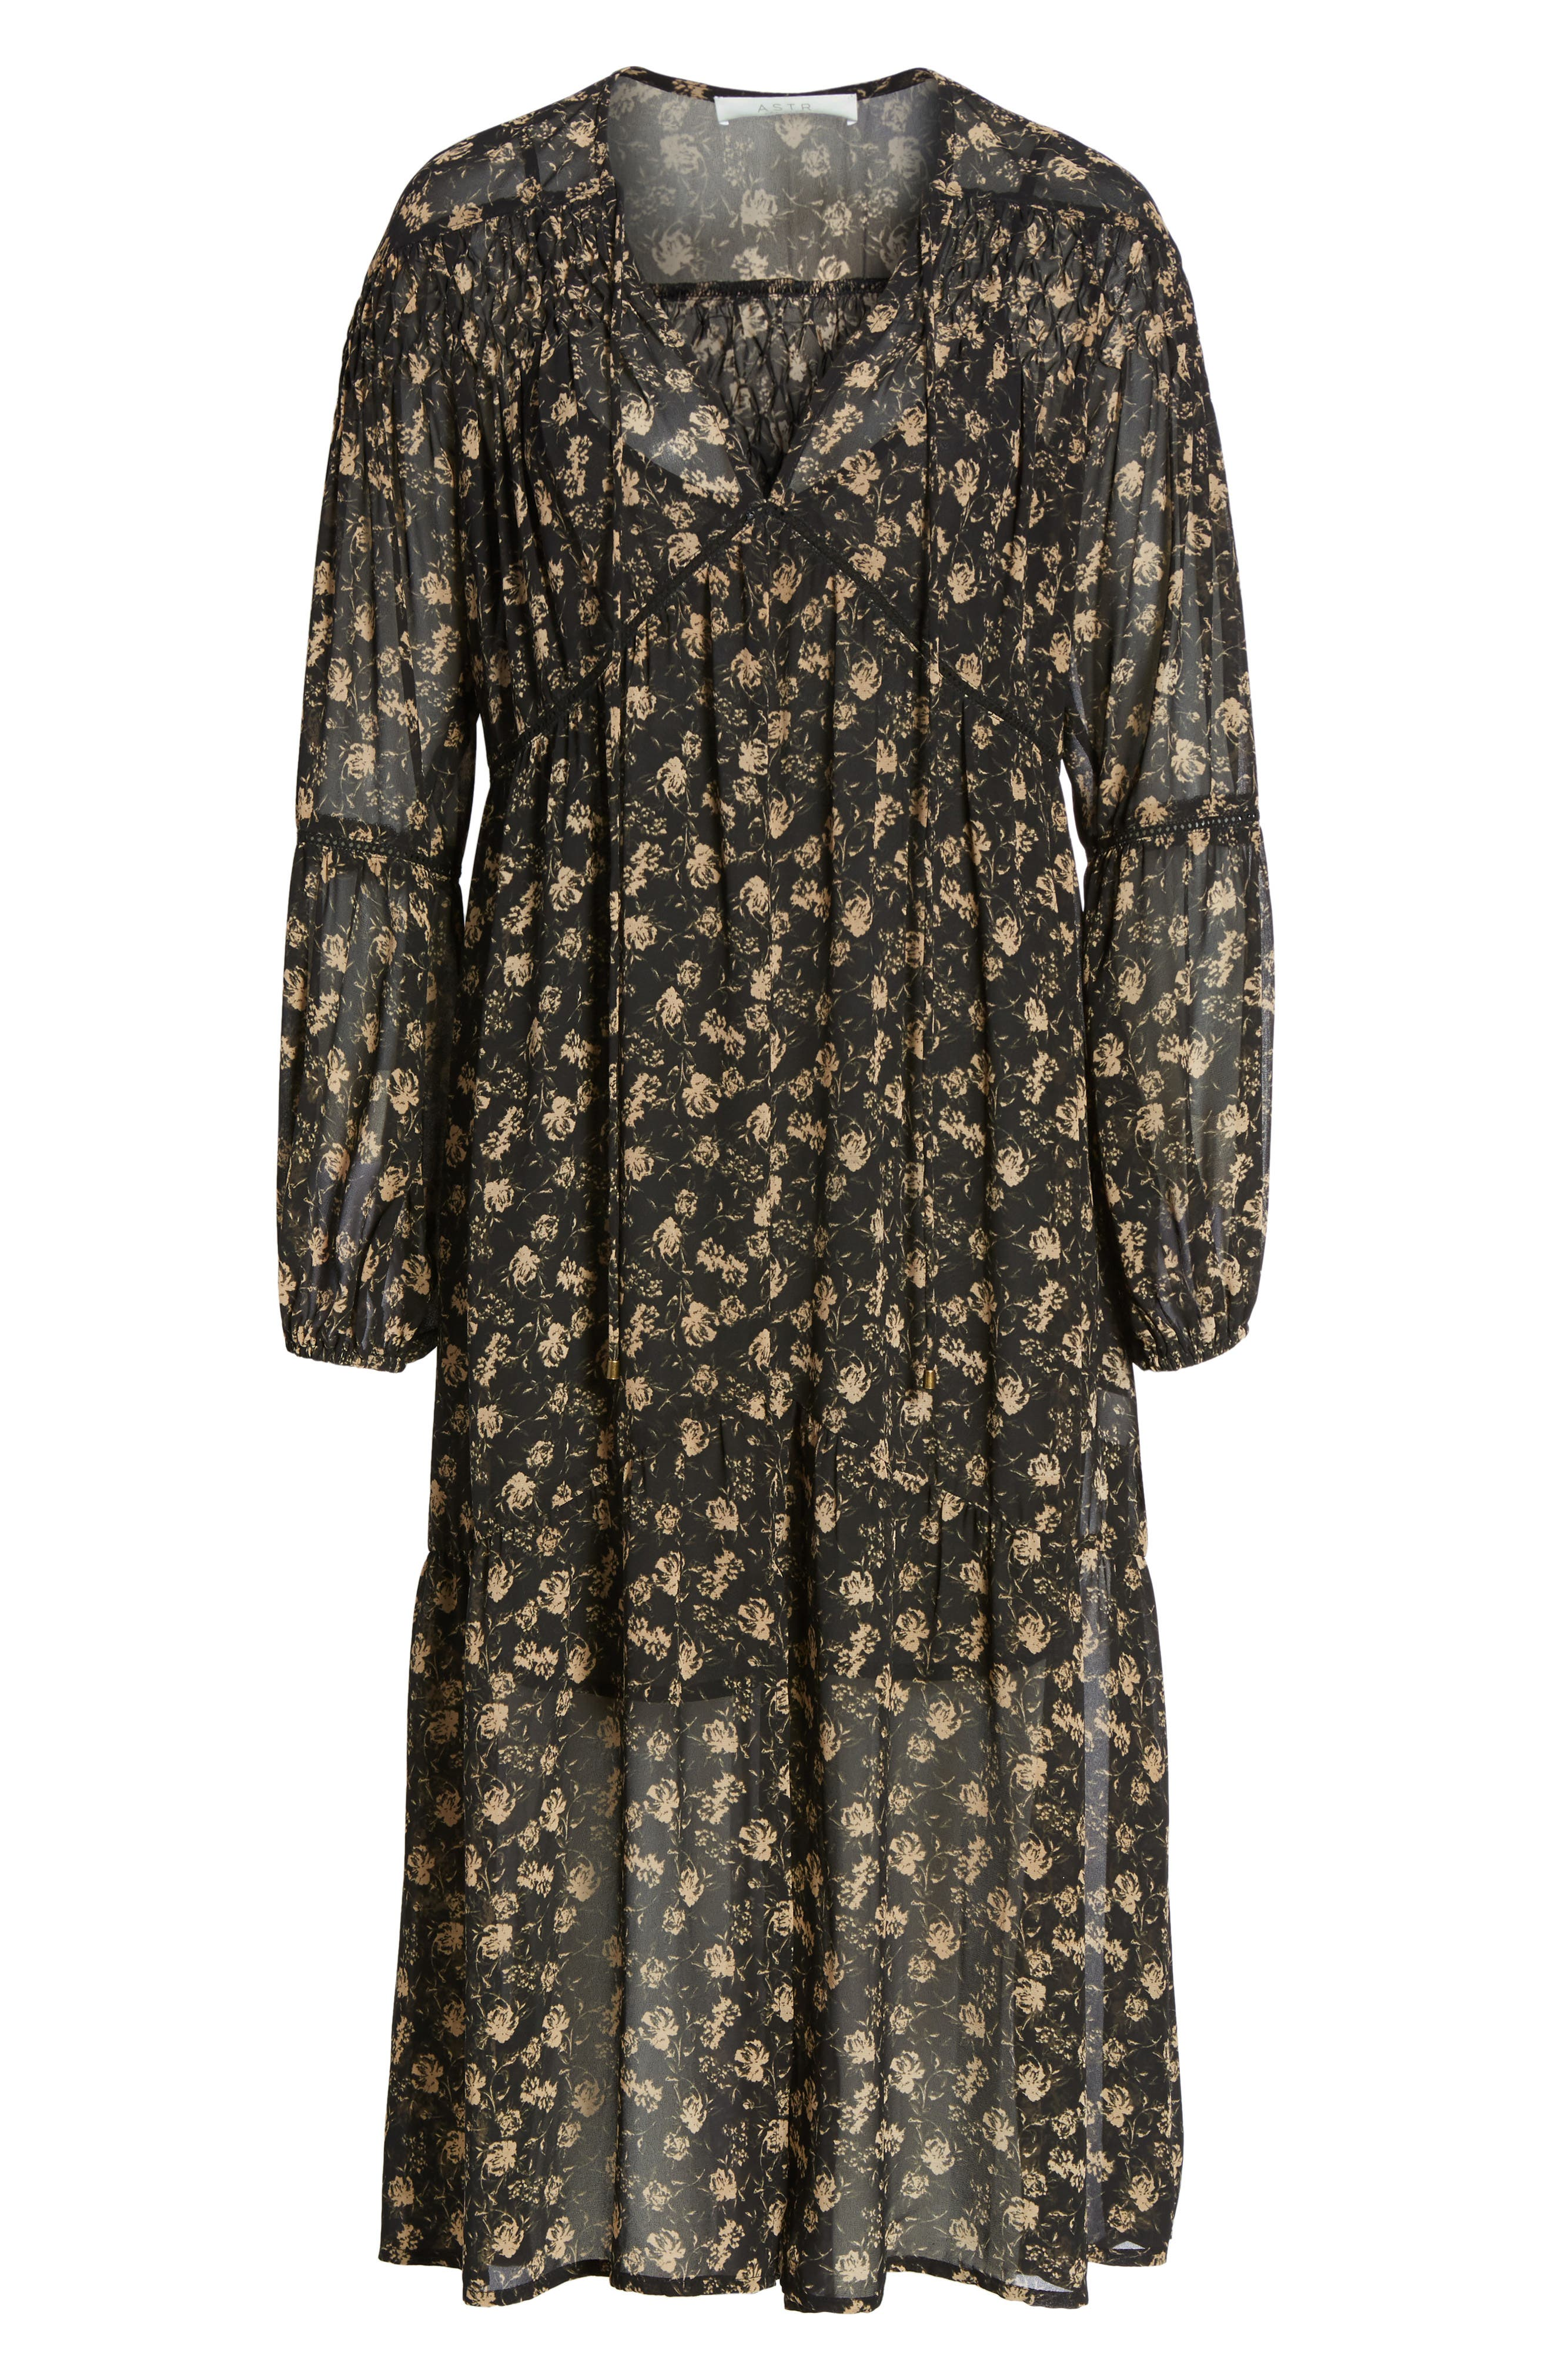 Ambrosia Shift Dress,                             Alternate thumbnail 7, color,                             Black-Tan Floral